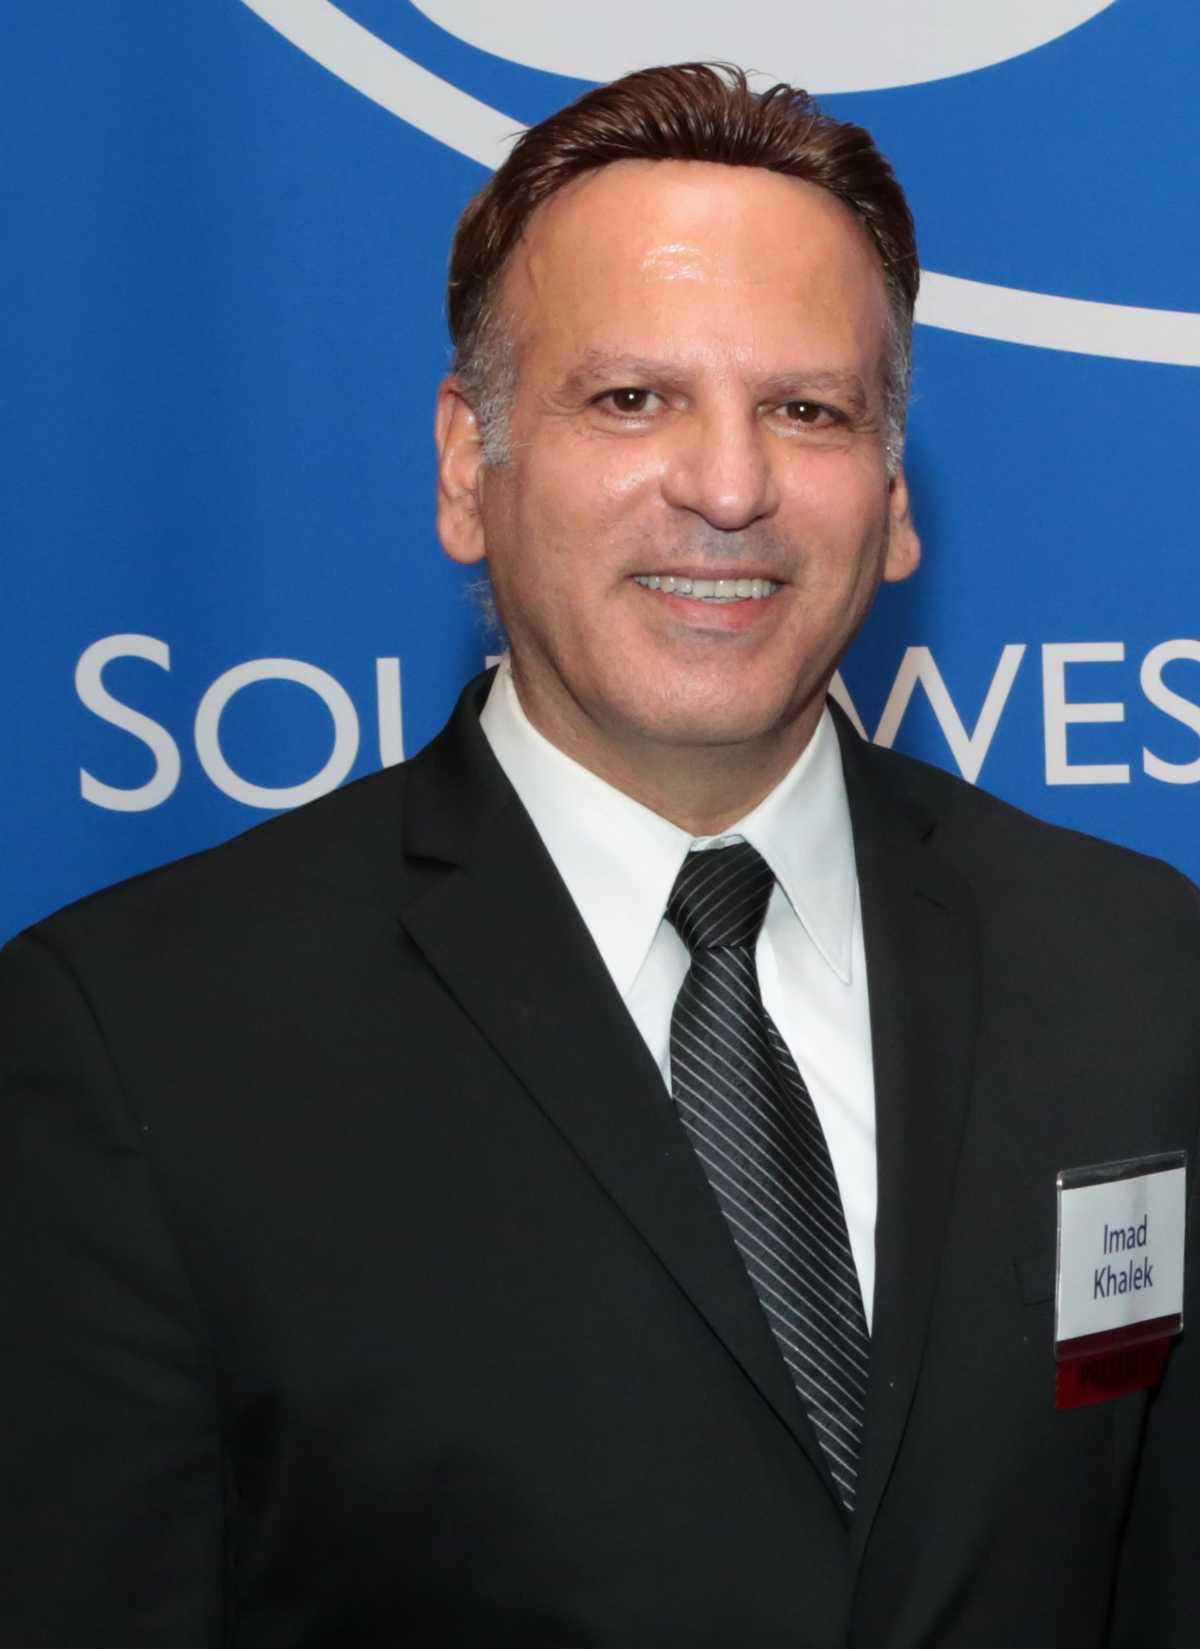 Portrait of Dr. Imad Khlaek against a blue background